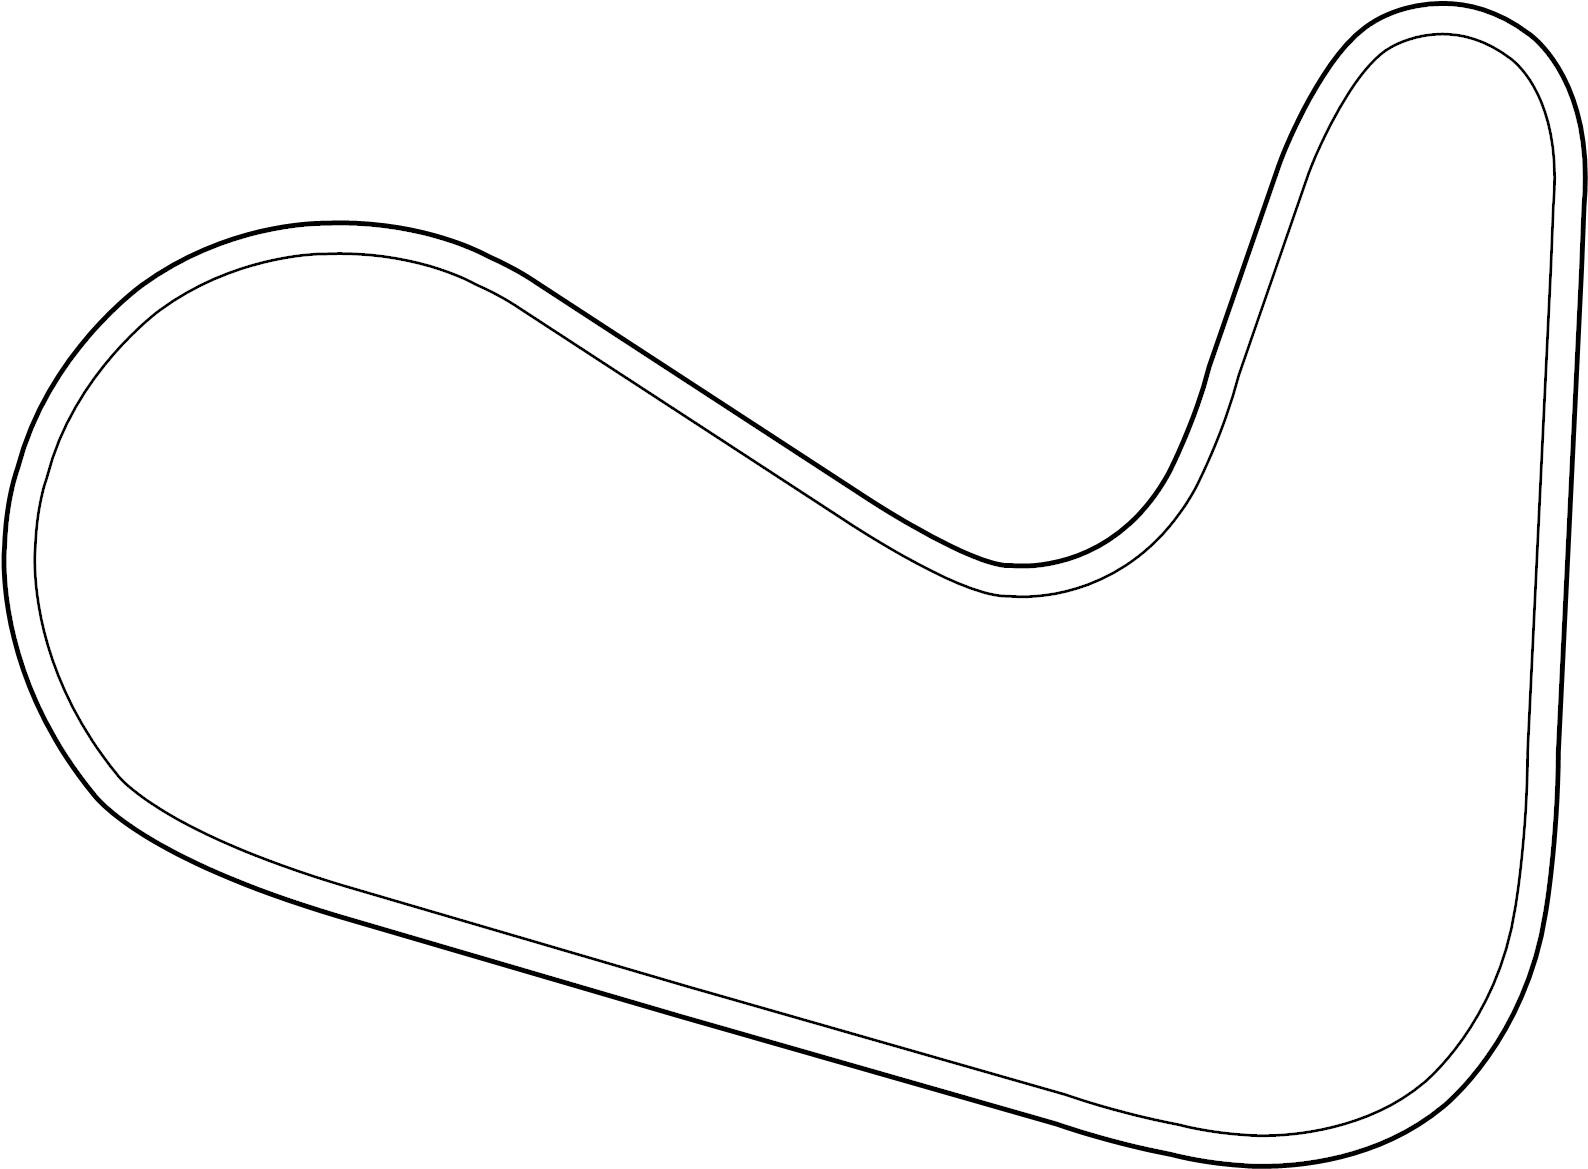 Infiniti Jx35 Serpentine Belt Drive